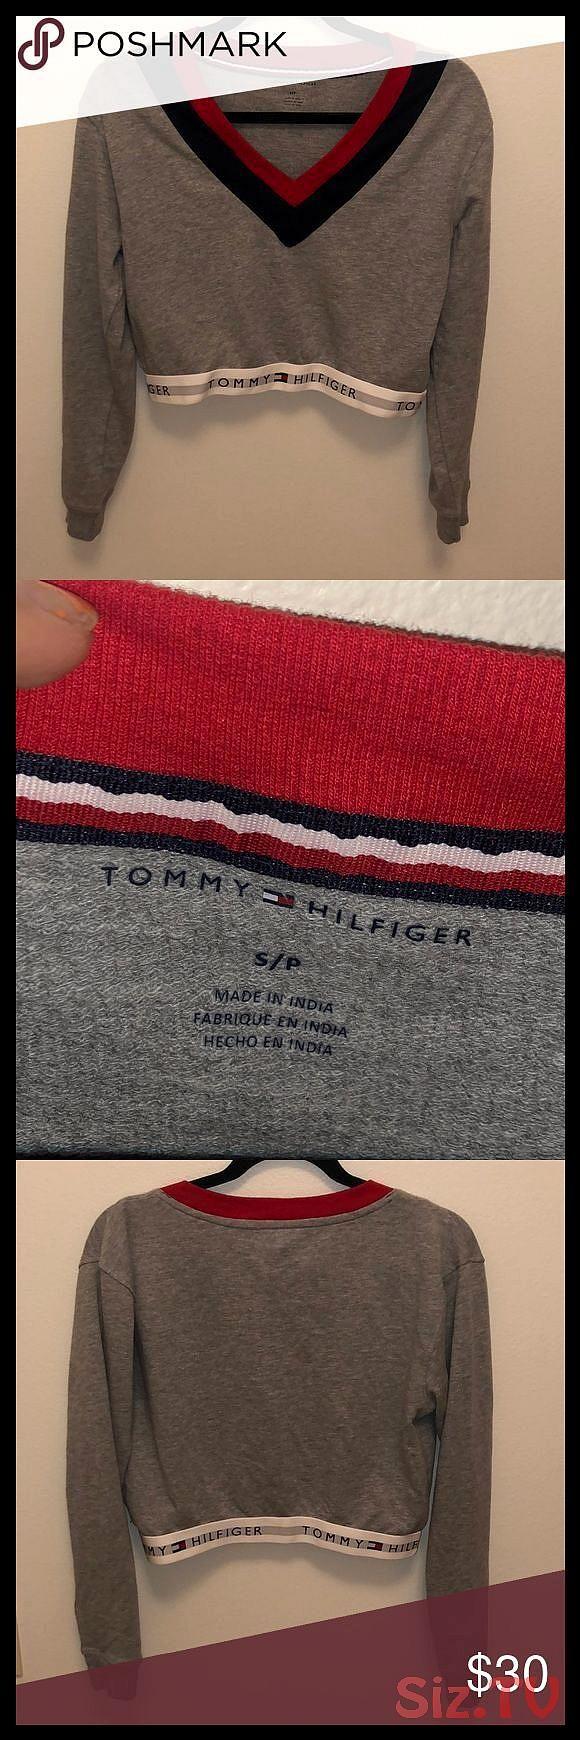 Tommy Hilfiger Crop Sweatshirt Tommy Hilfiger Crop Sweatshirt Worn Once Gray Red And Navy Tommy Hilfiger Crop Sweatshirt Tommy Hilfiger Tops Sweatshirts Hoodie [ 1740 x 580 Pixel ]